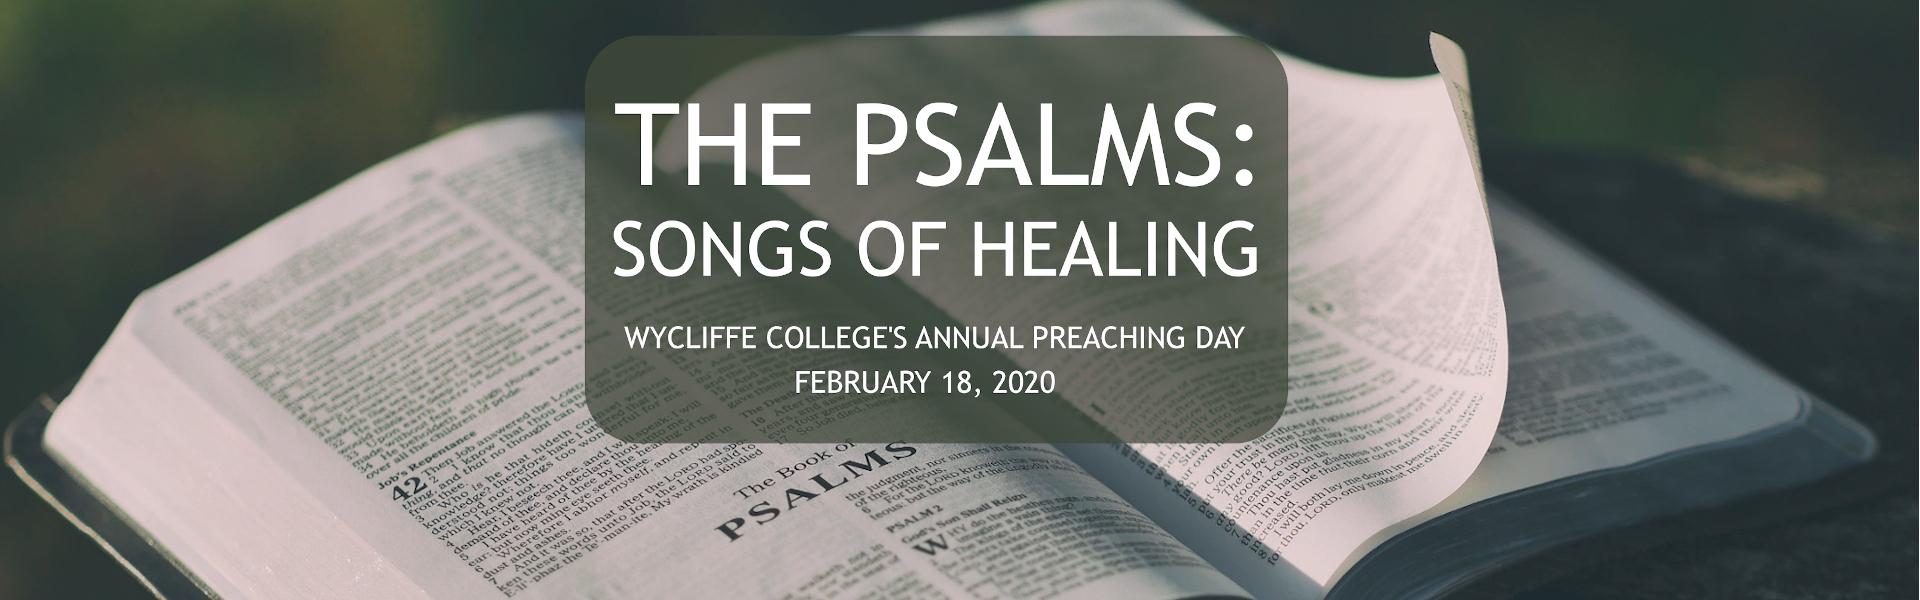 Preaching Day 2020